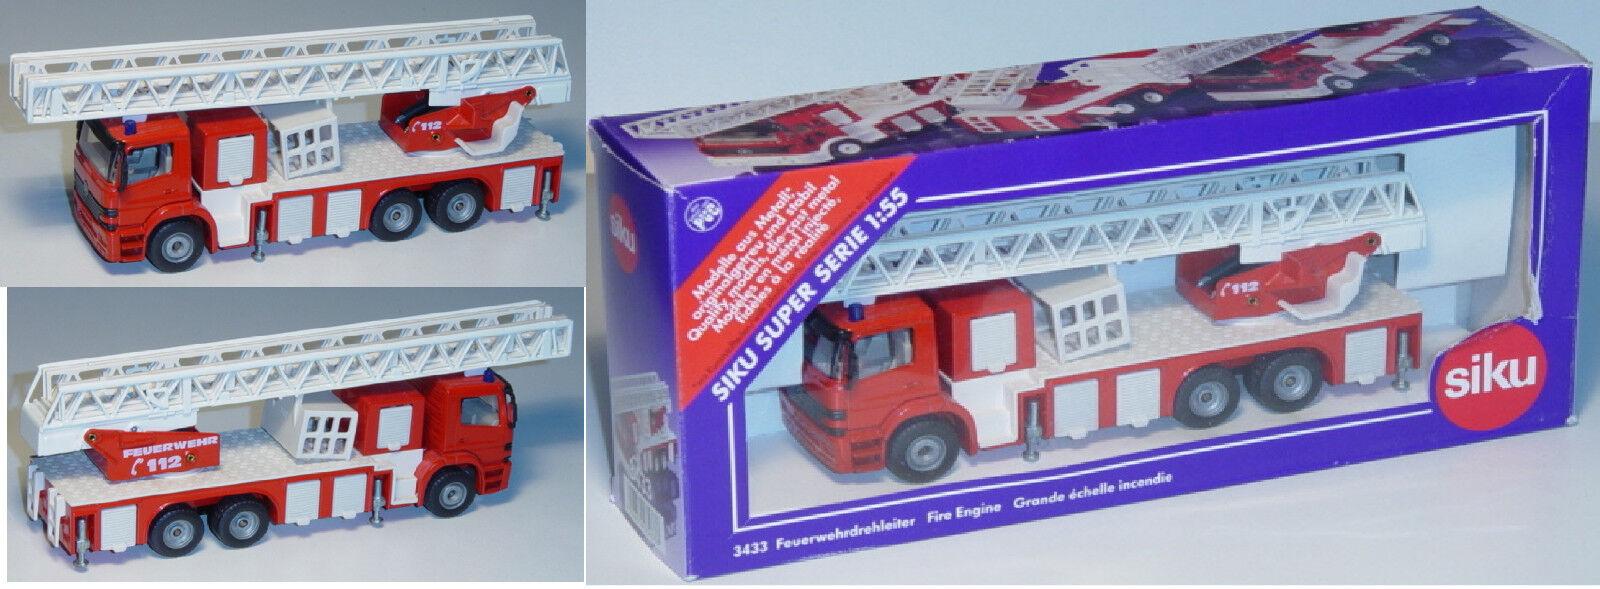 Siku Siku Siku Super 3433 Mercedes-Benz Atego Feuerwehrdrehleiter, ca. 1 55 266f2a